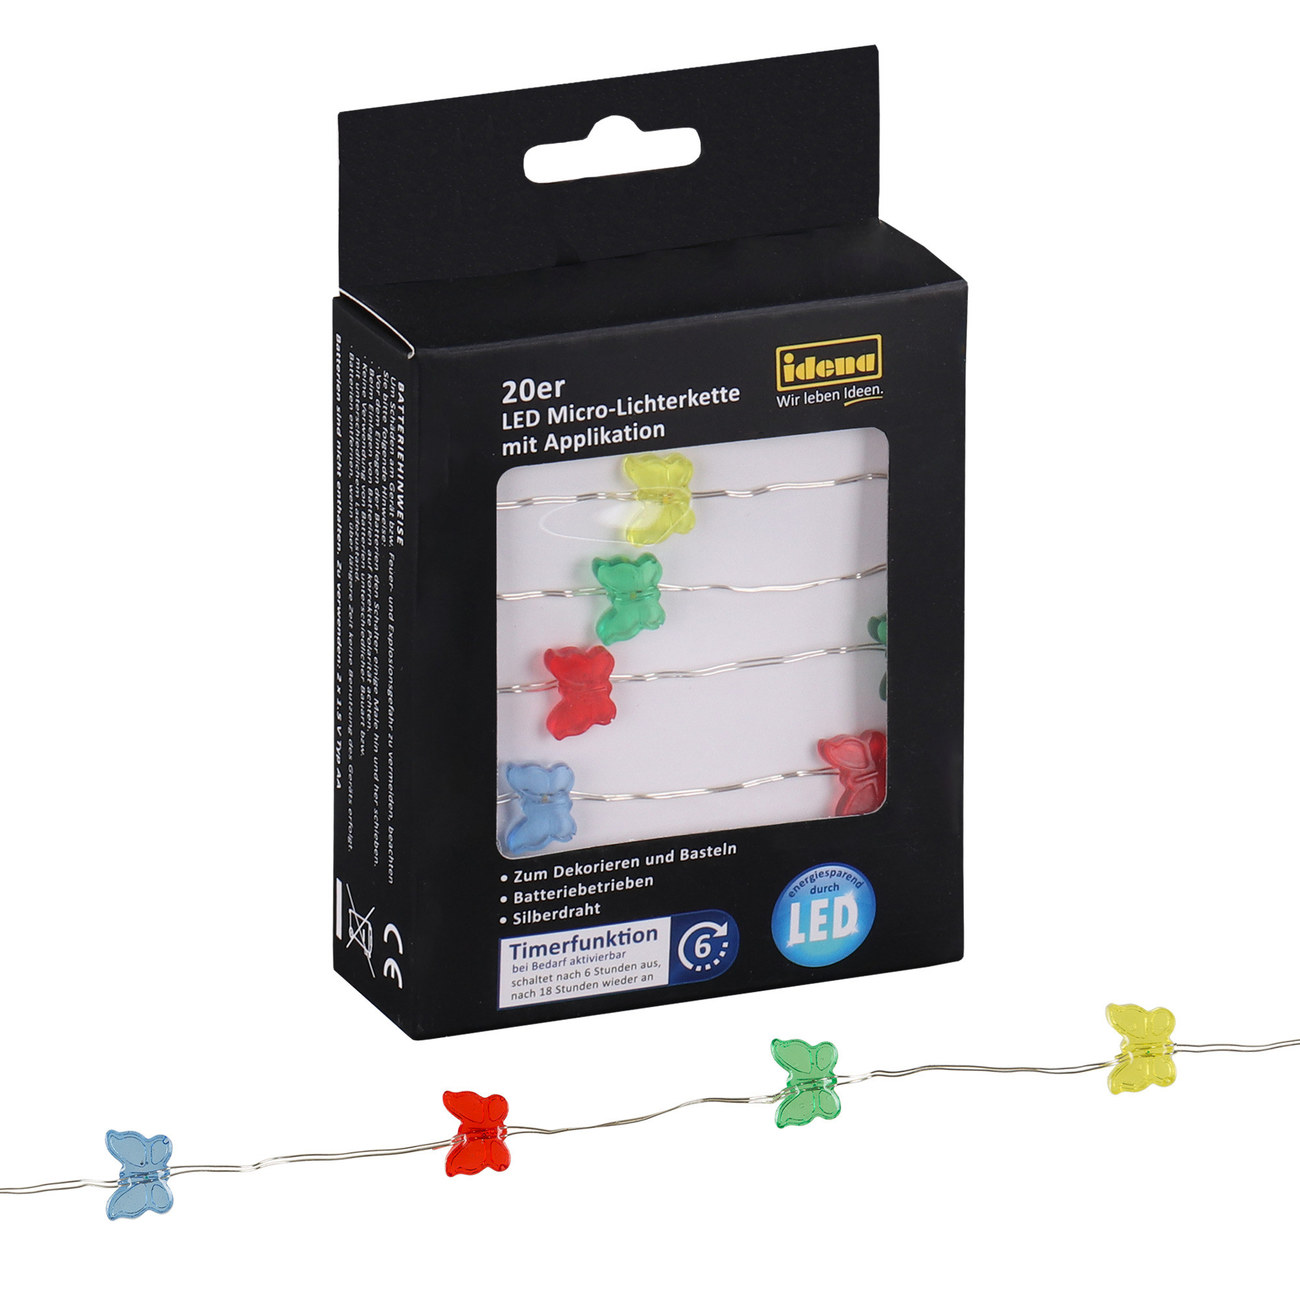 Idena Markenshop | 20er LED Micro-Lichterkette \